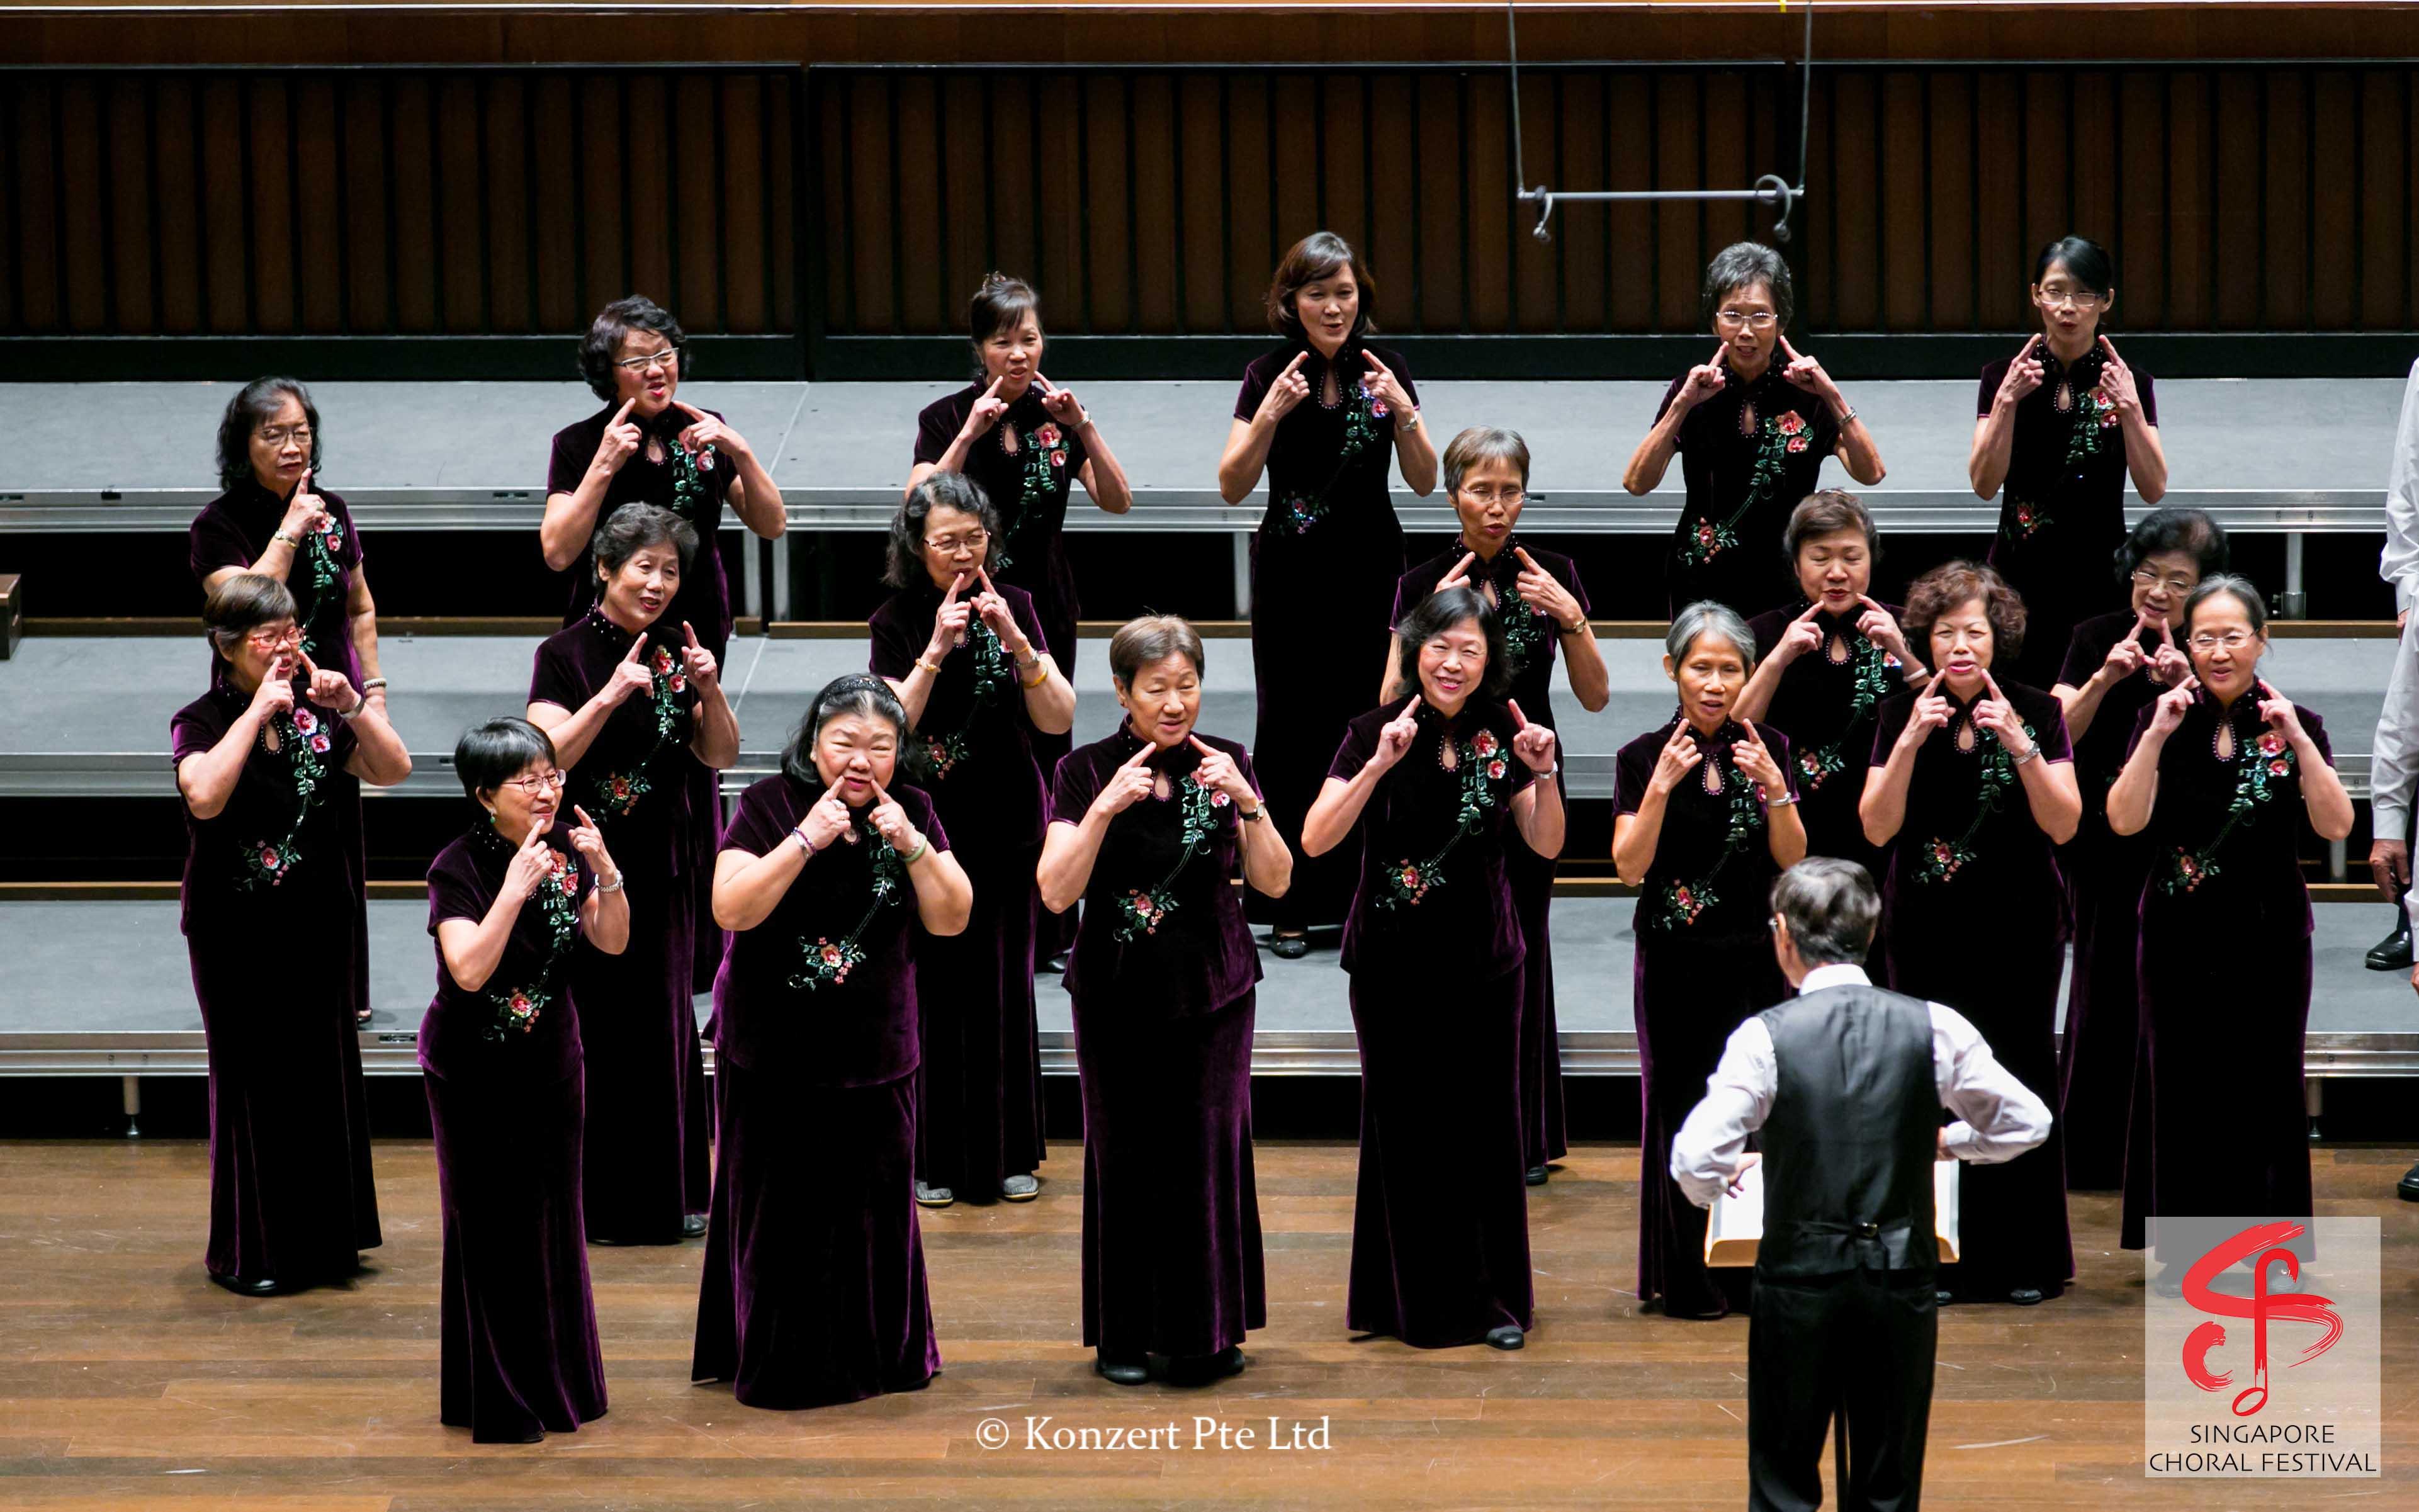 Singapore Choral Festival 8-8-15 (198).jpg